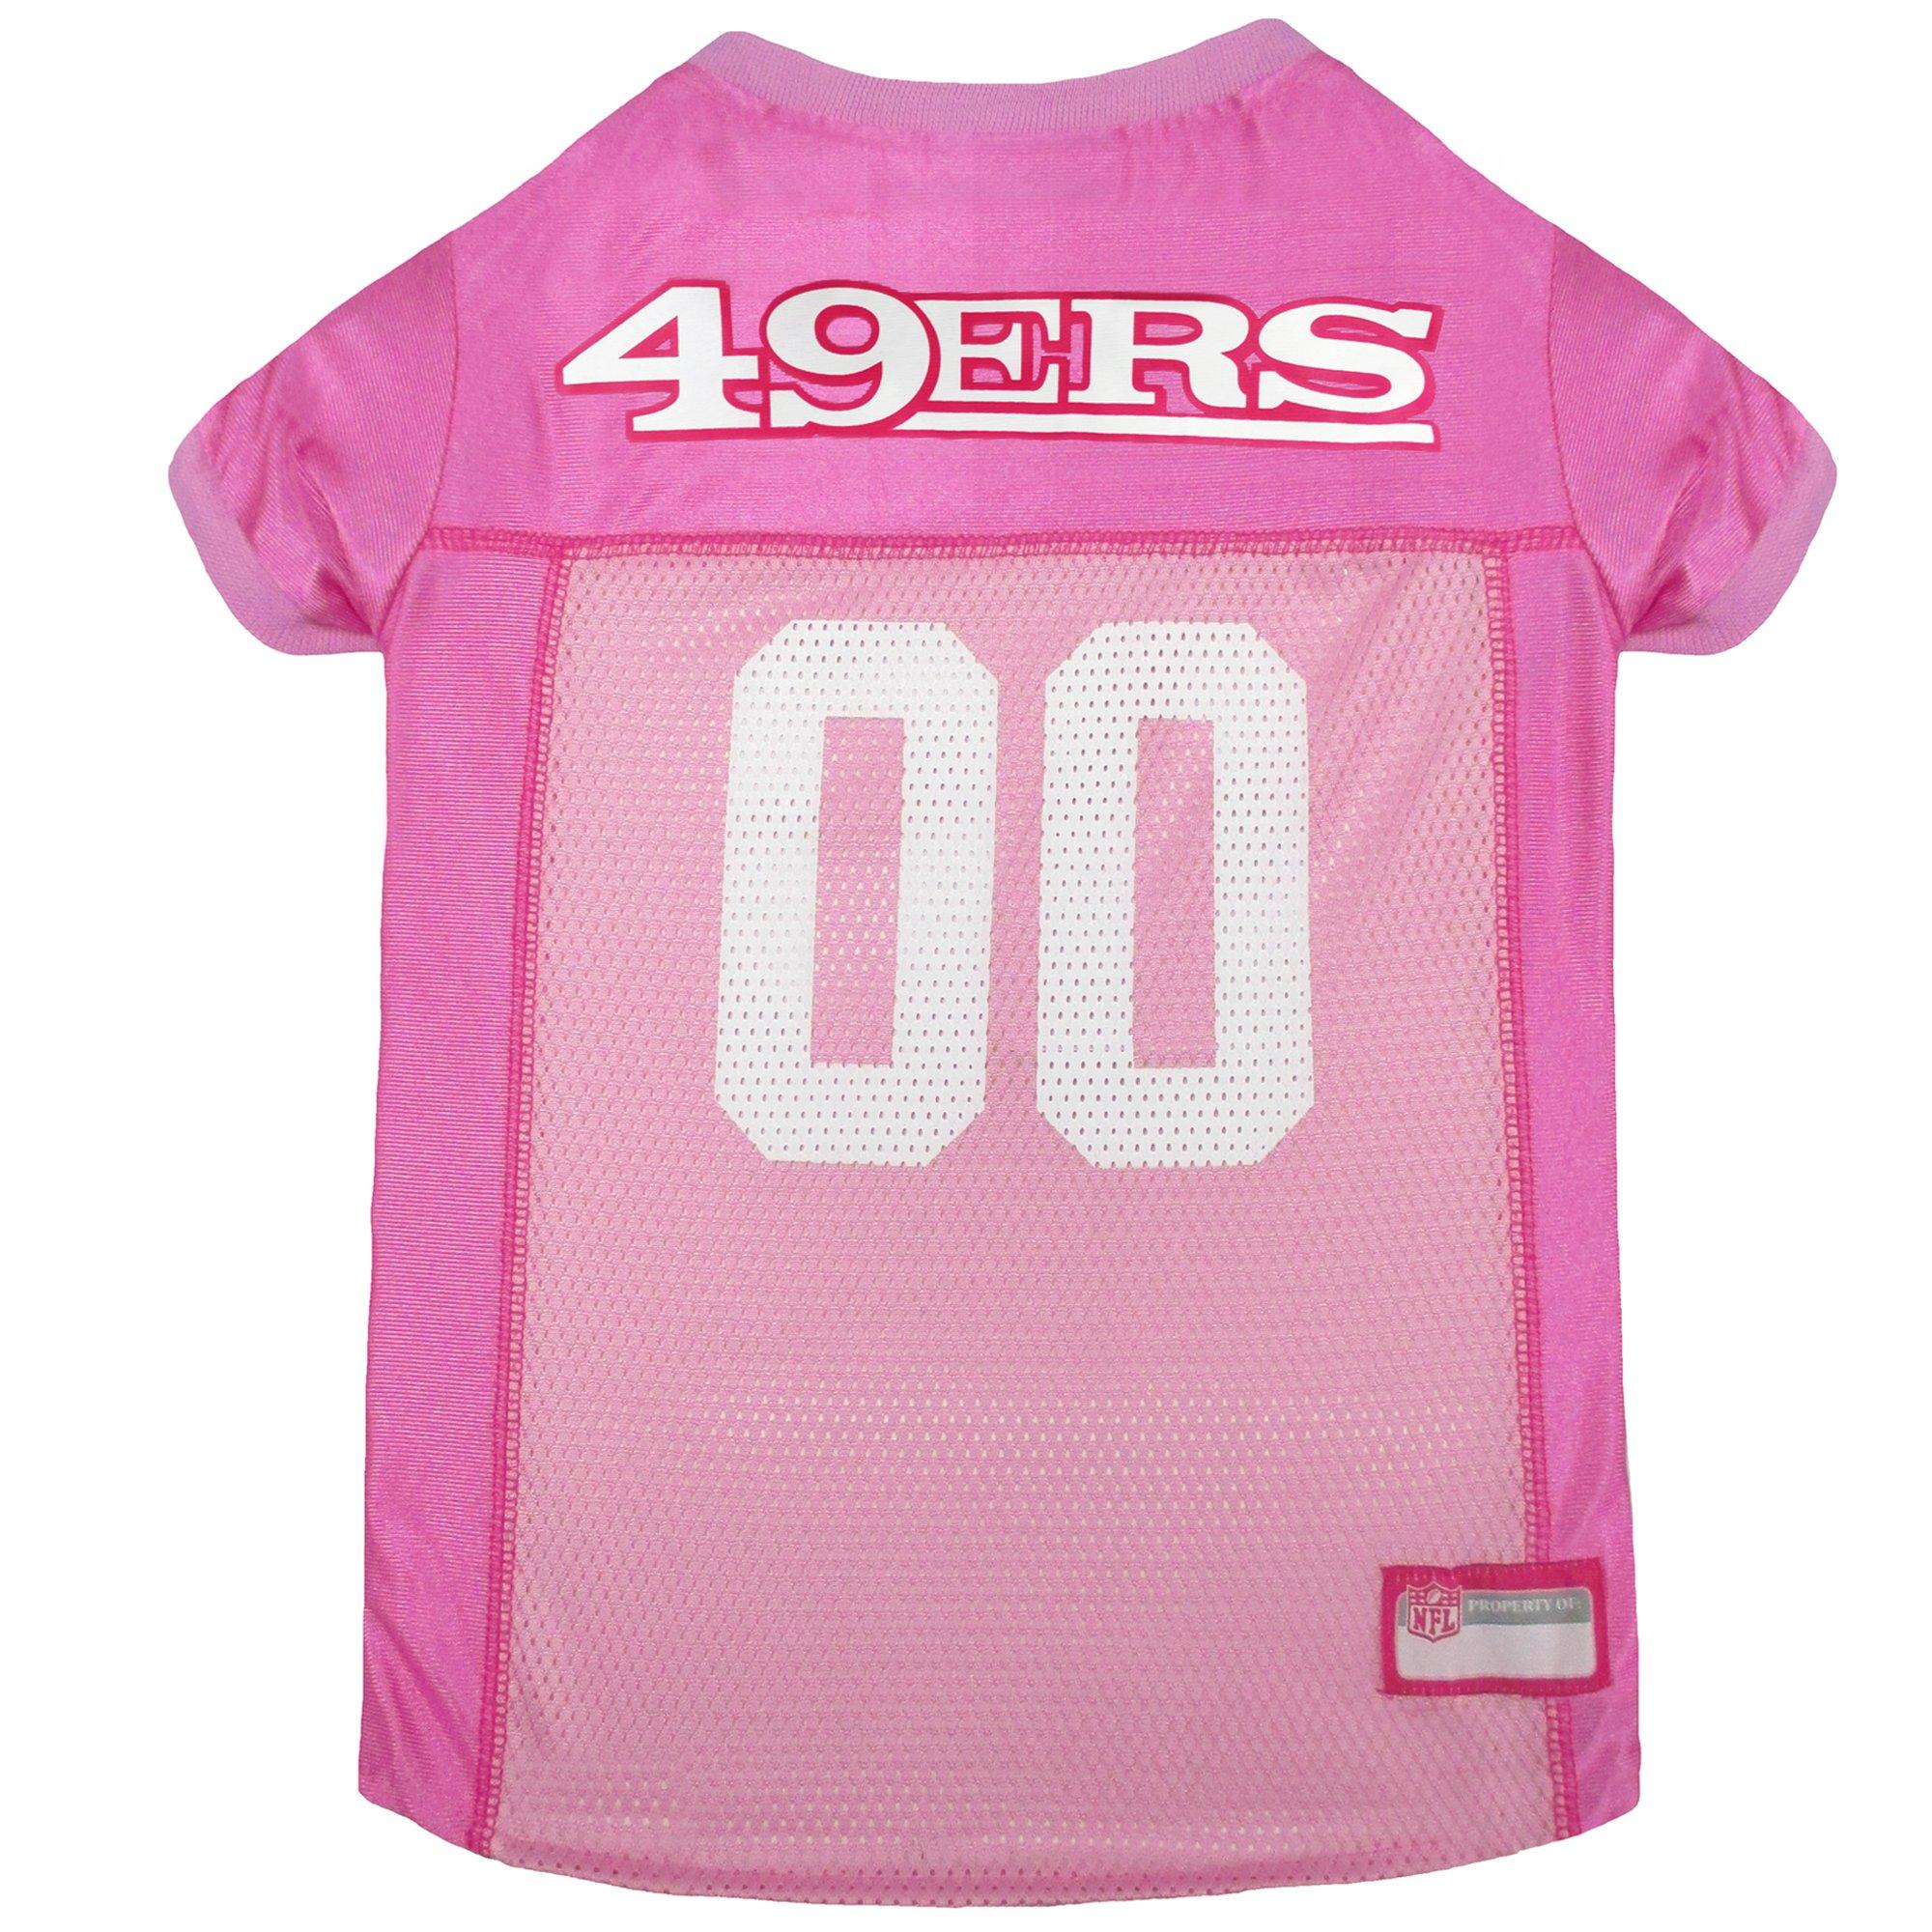 reputable site 79fad 66e75 Pets First San Francisco 49ers NFL Pink Mesh Jersey, Medium | Petco